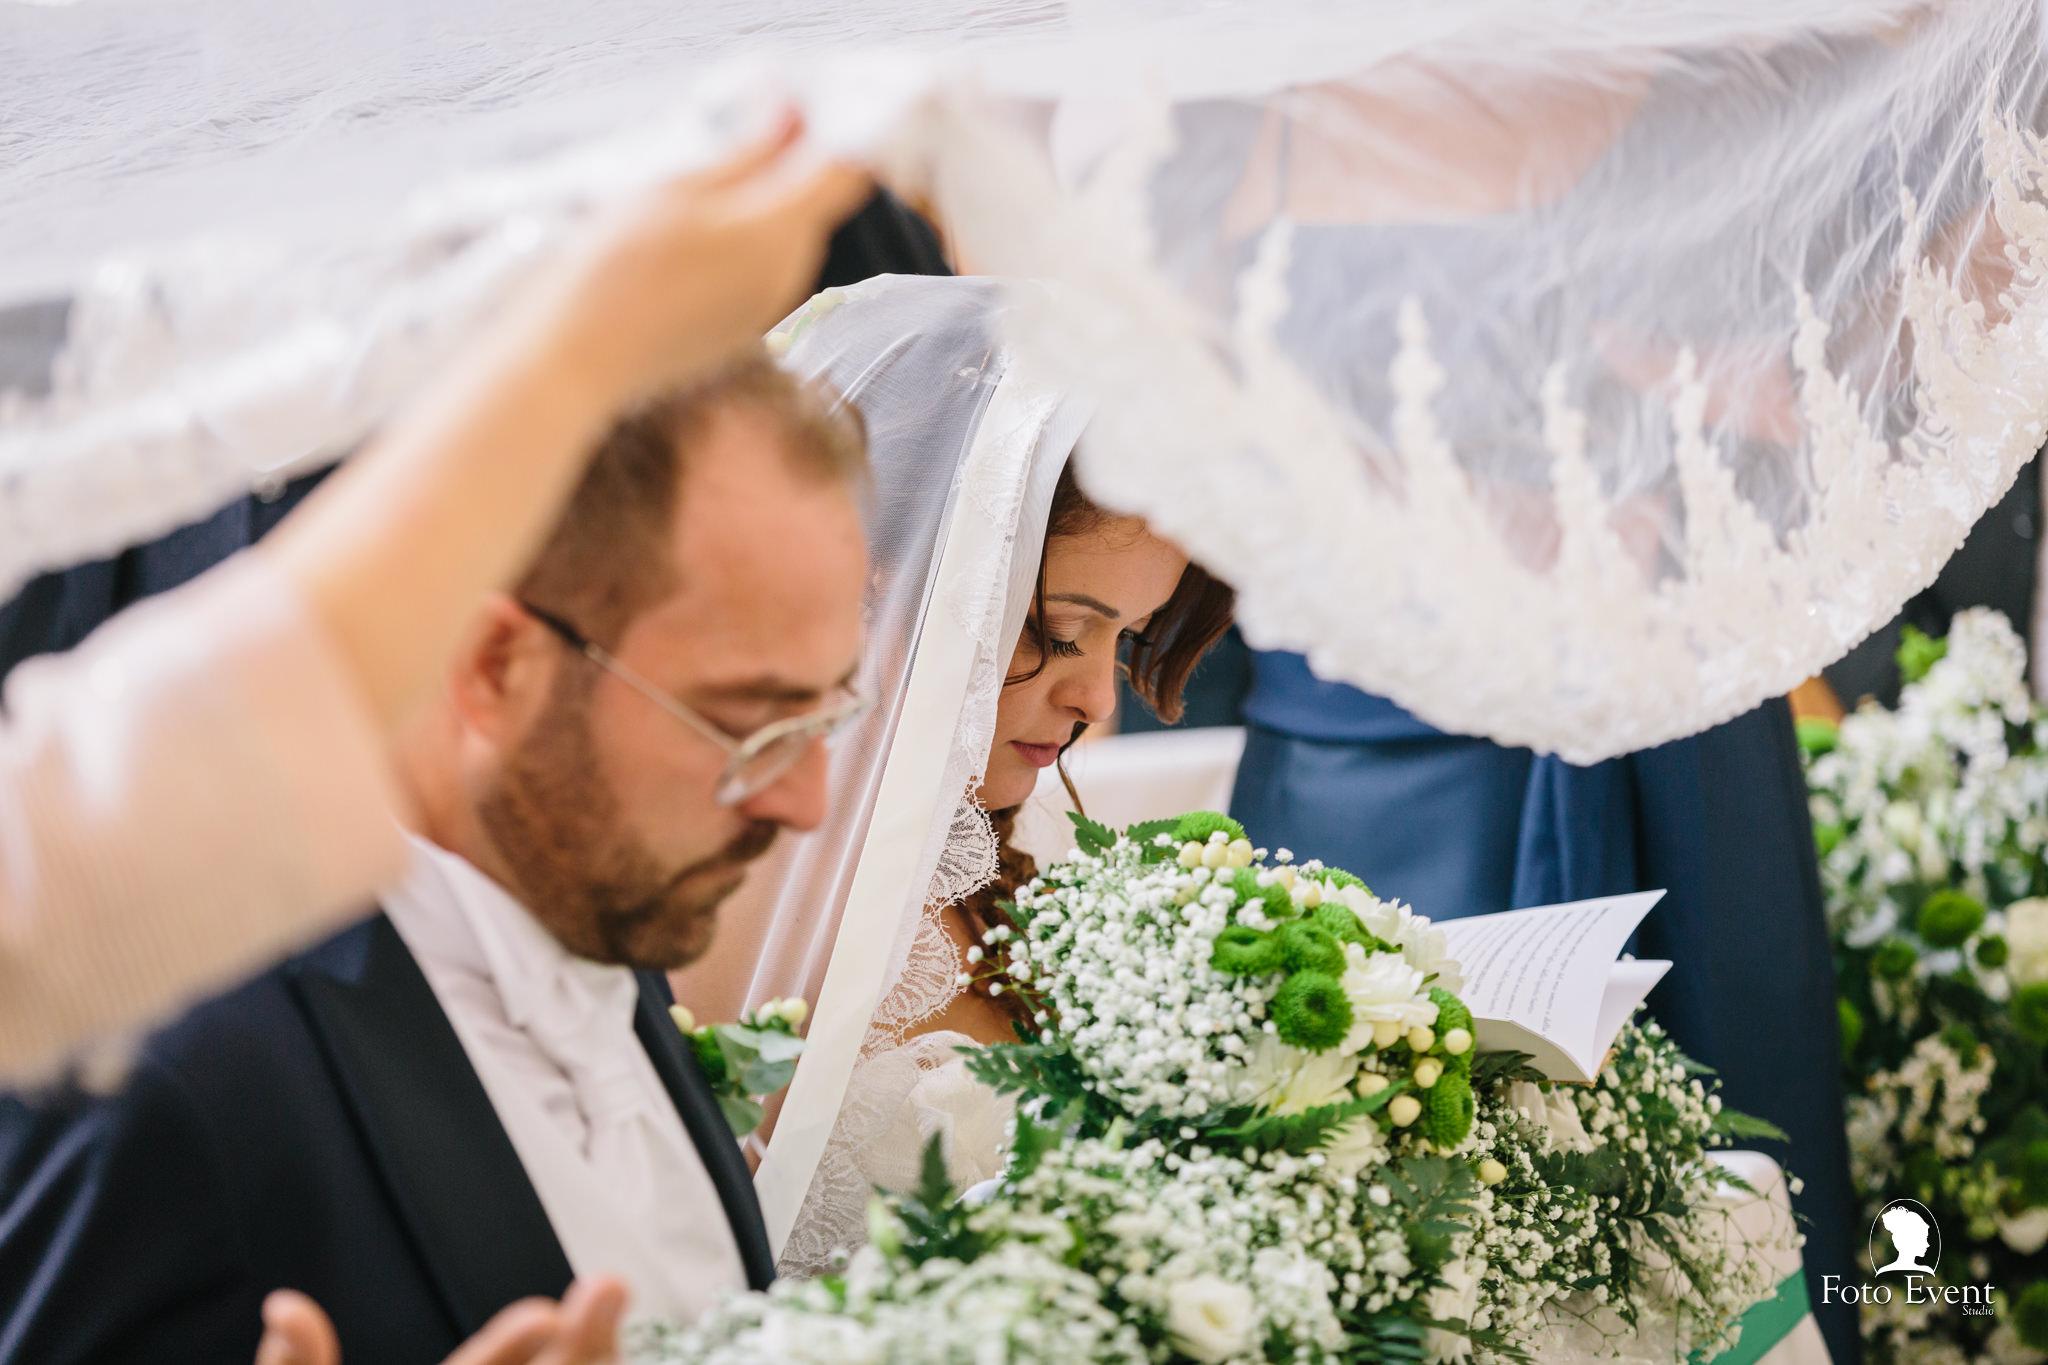 041-2020-10-15-Matrimonio-Noemi-e-Salvatore-Paterno-zoom-541